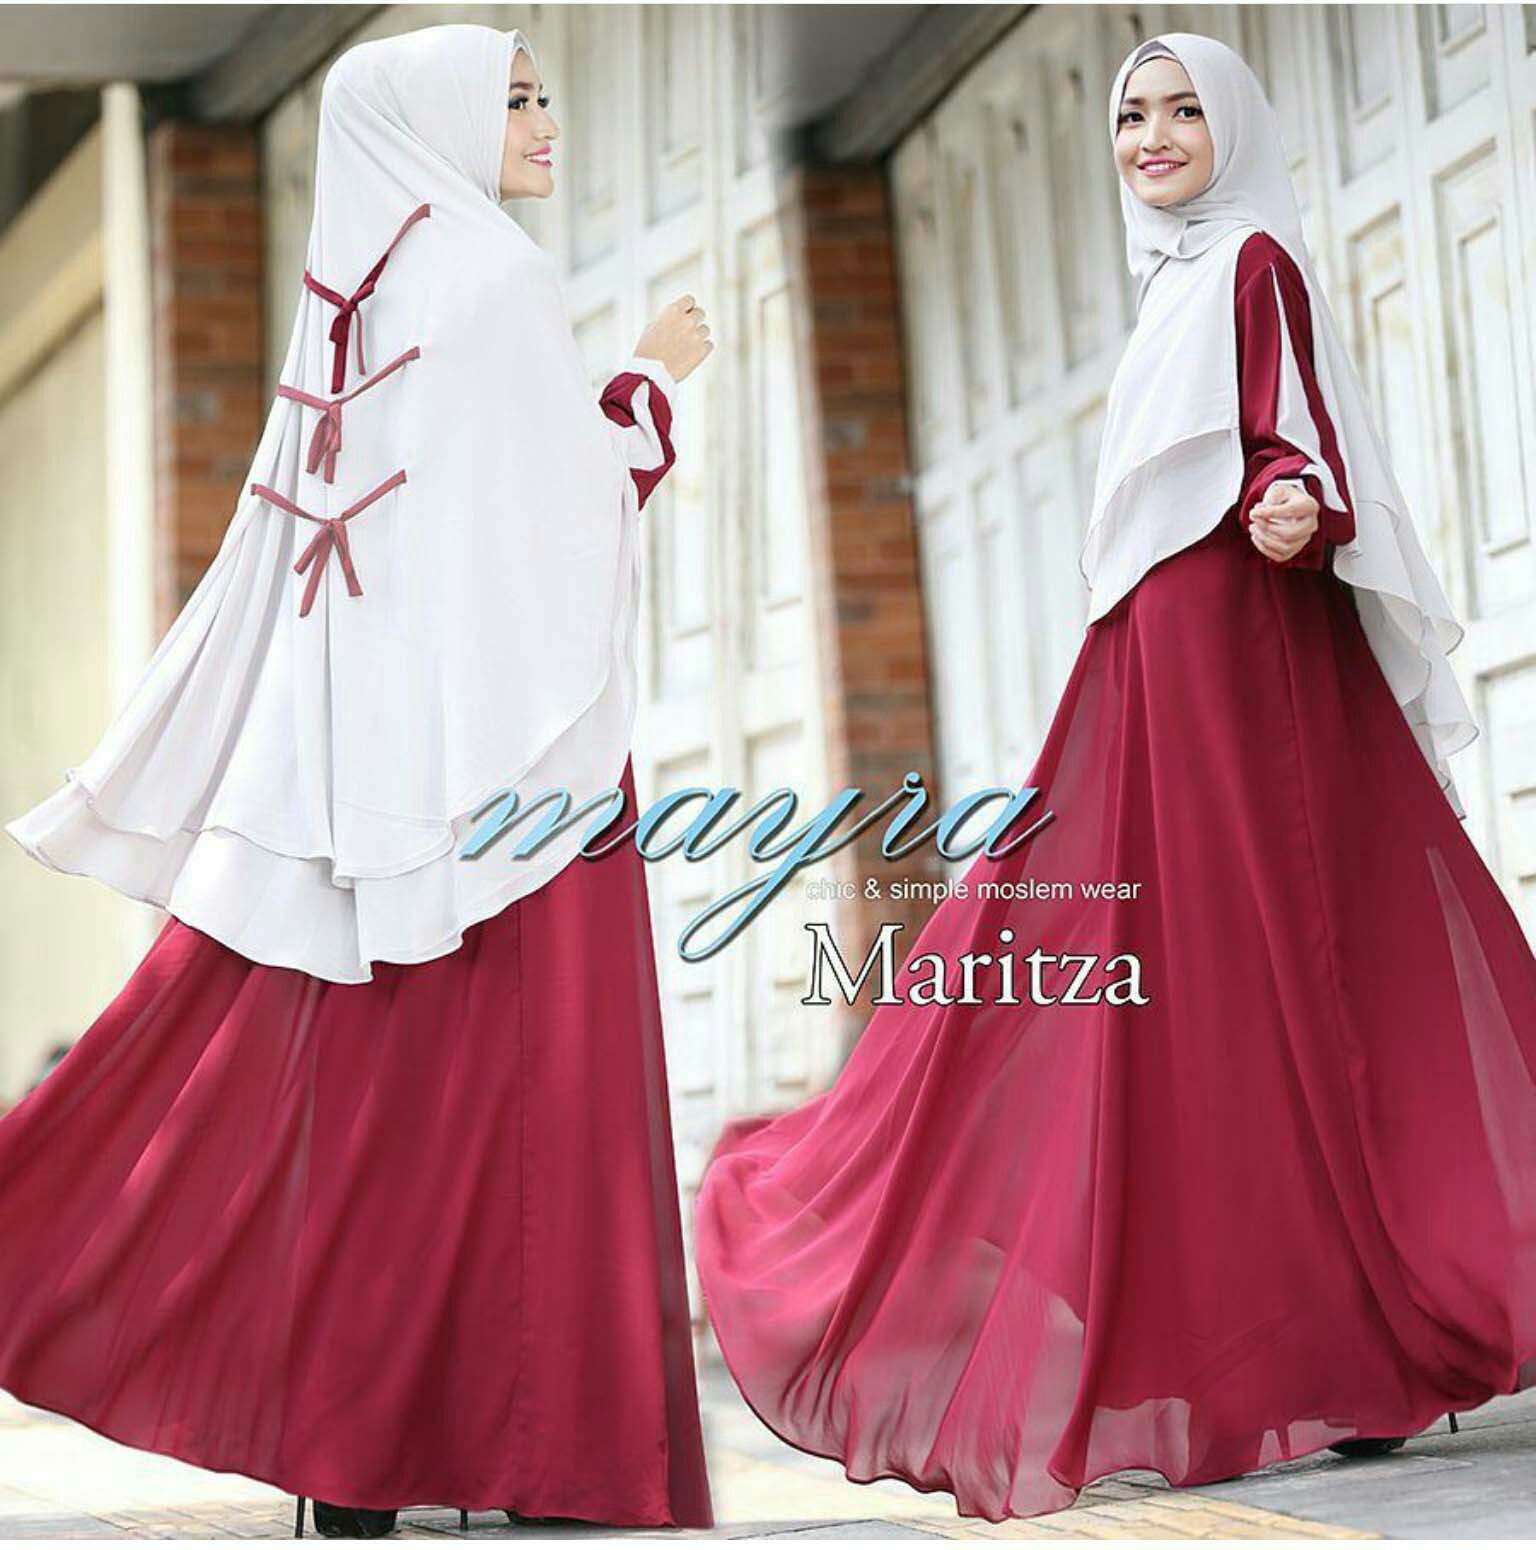 RG2204 Gamis Syari Terbaru 2017 Murah Wanita Baju Murah Hijab Baju Pesta Baju Lebaran Modis Maxi New Olshop Fashion Olshop Wanita di Carousell